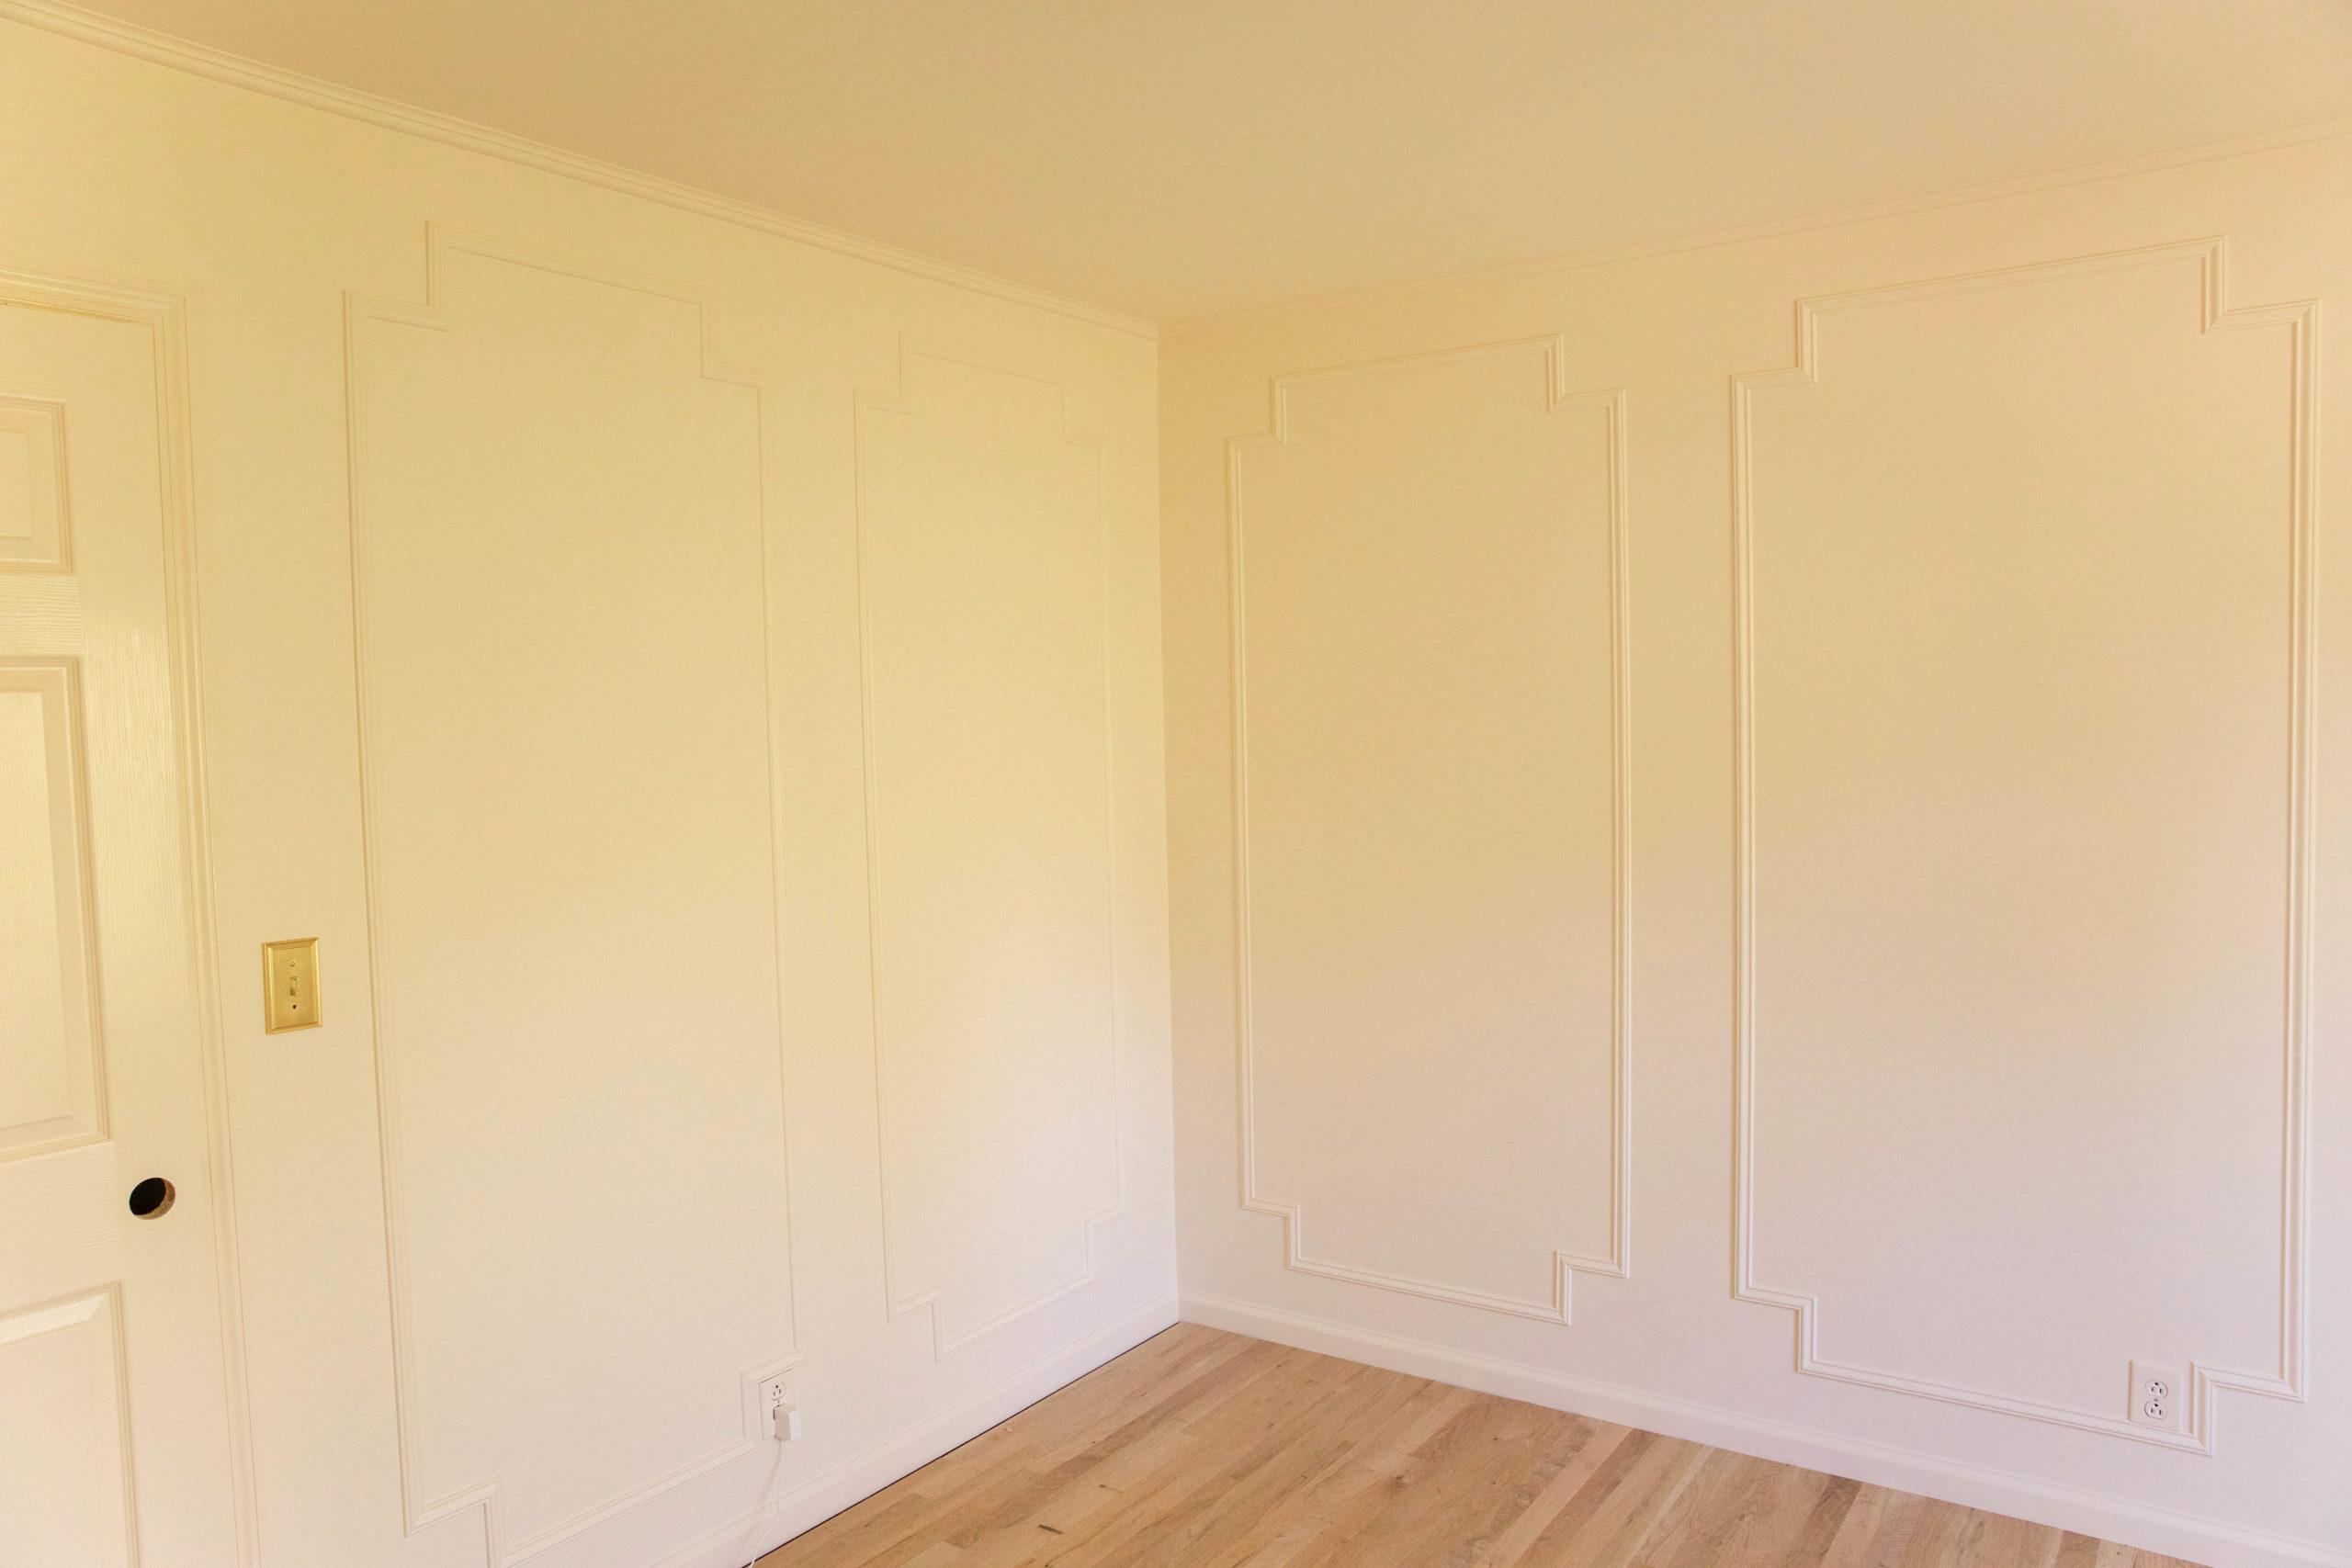 wall moulding frames